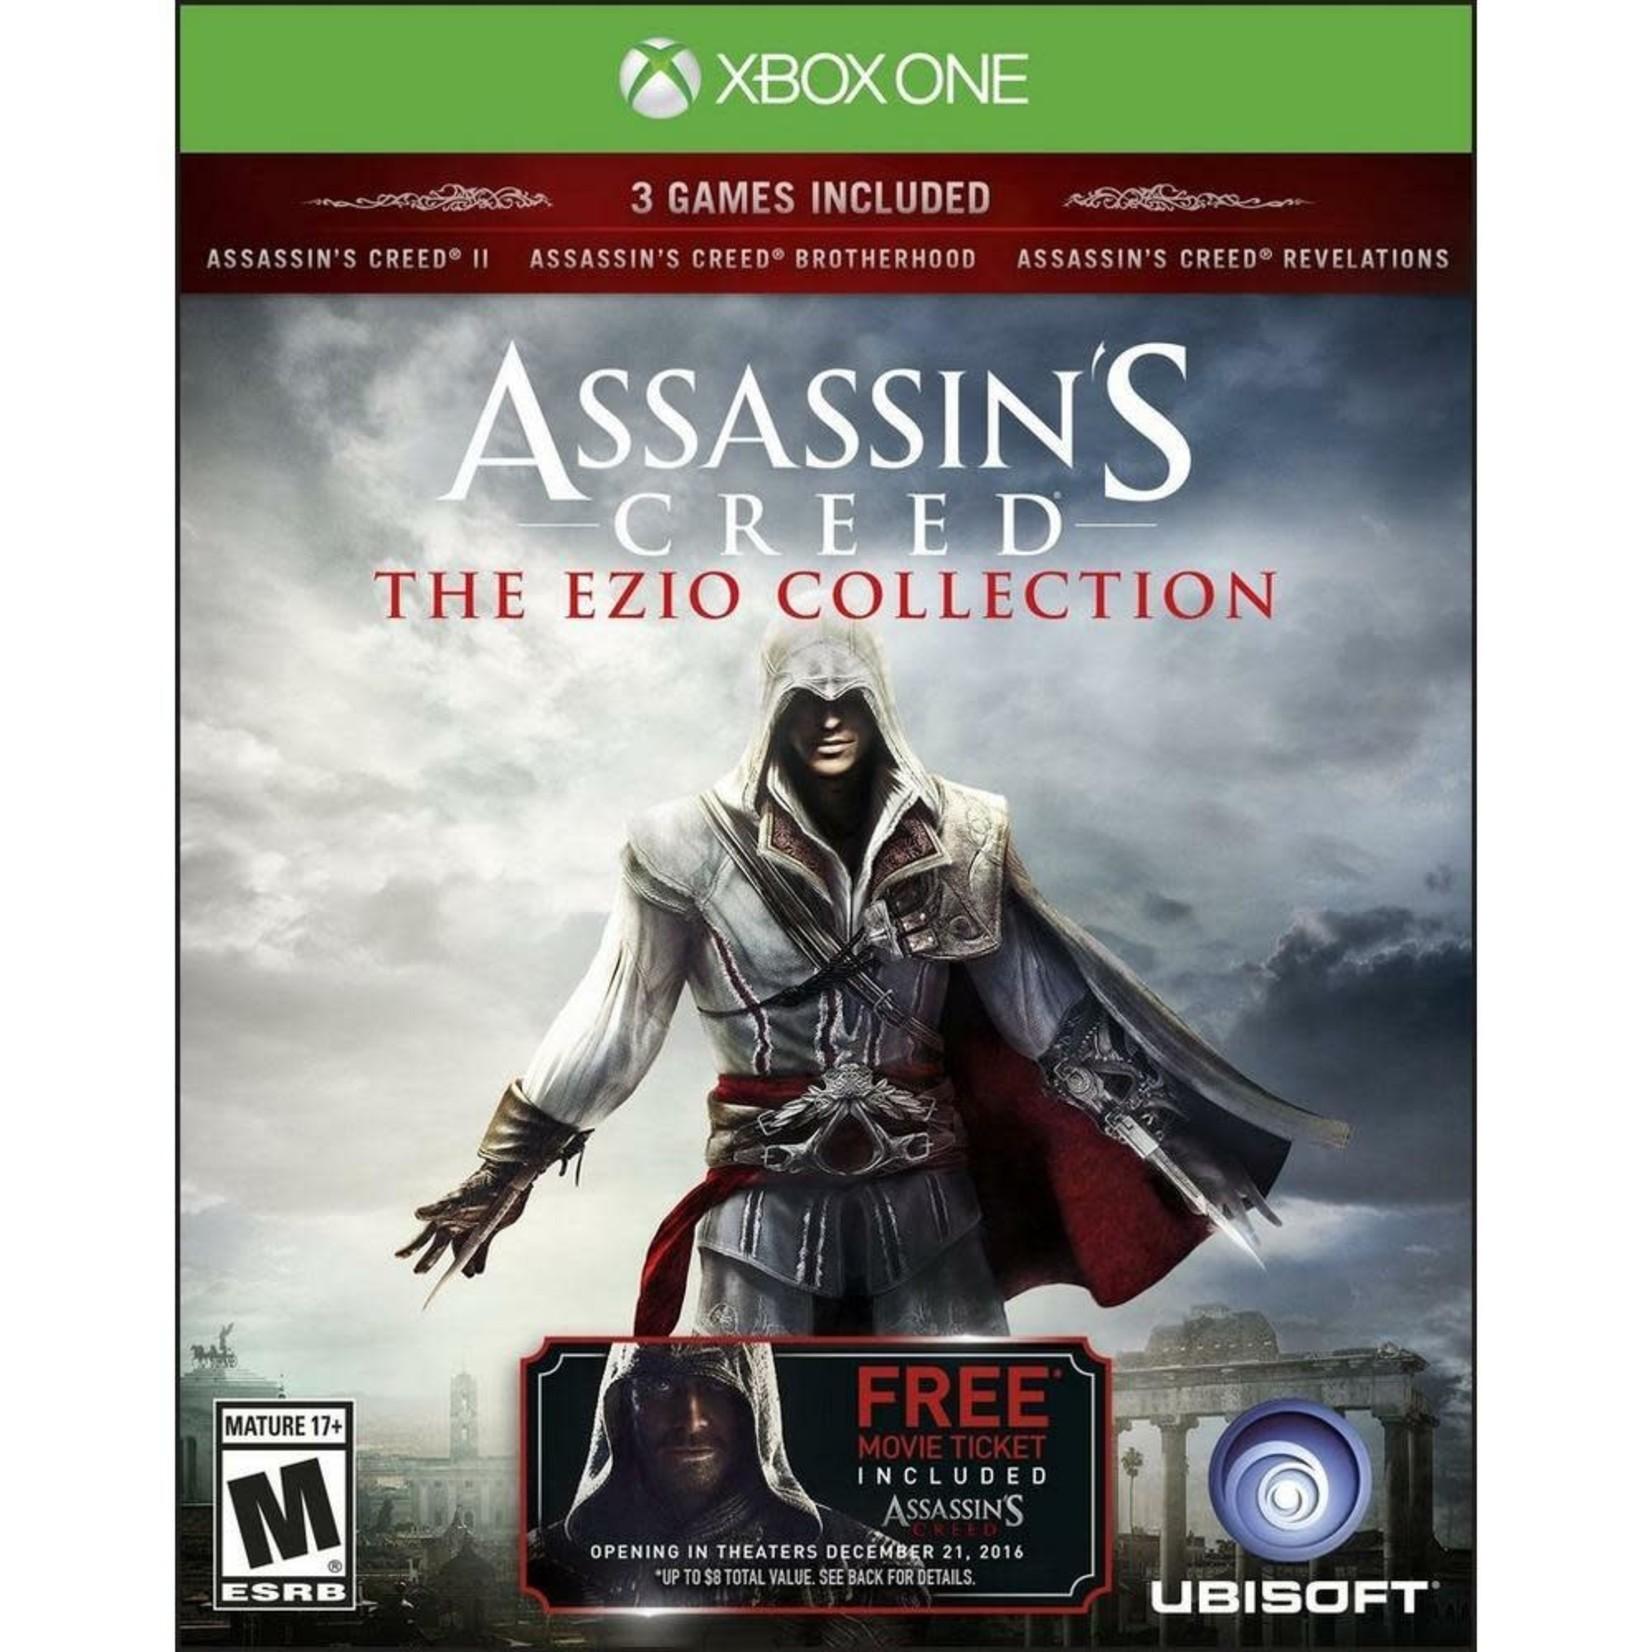 XB1U-Assassin's Creed: The Ezio Collection